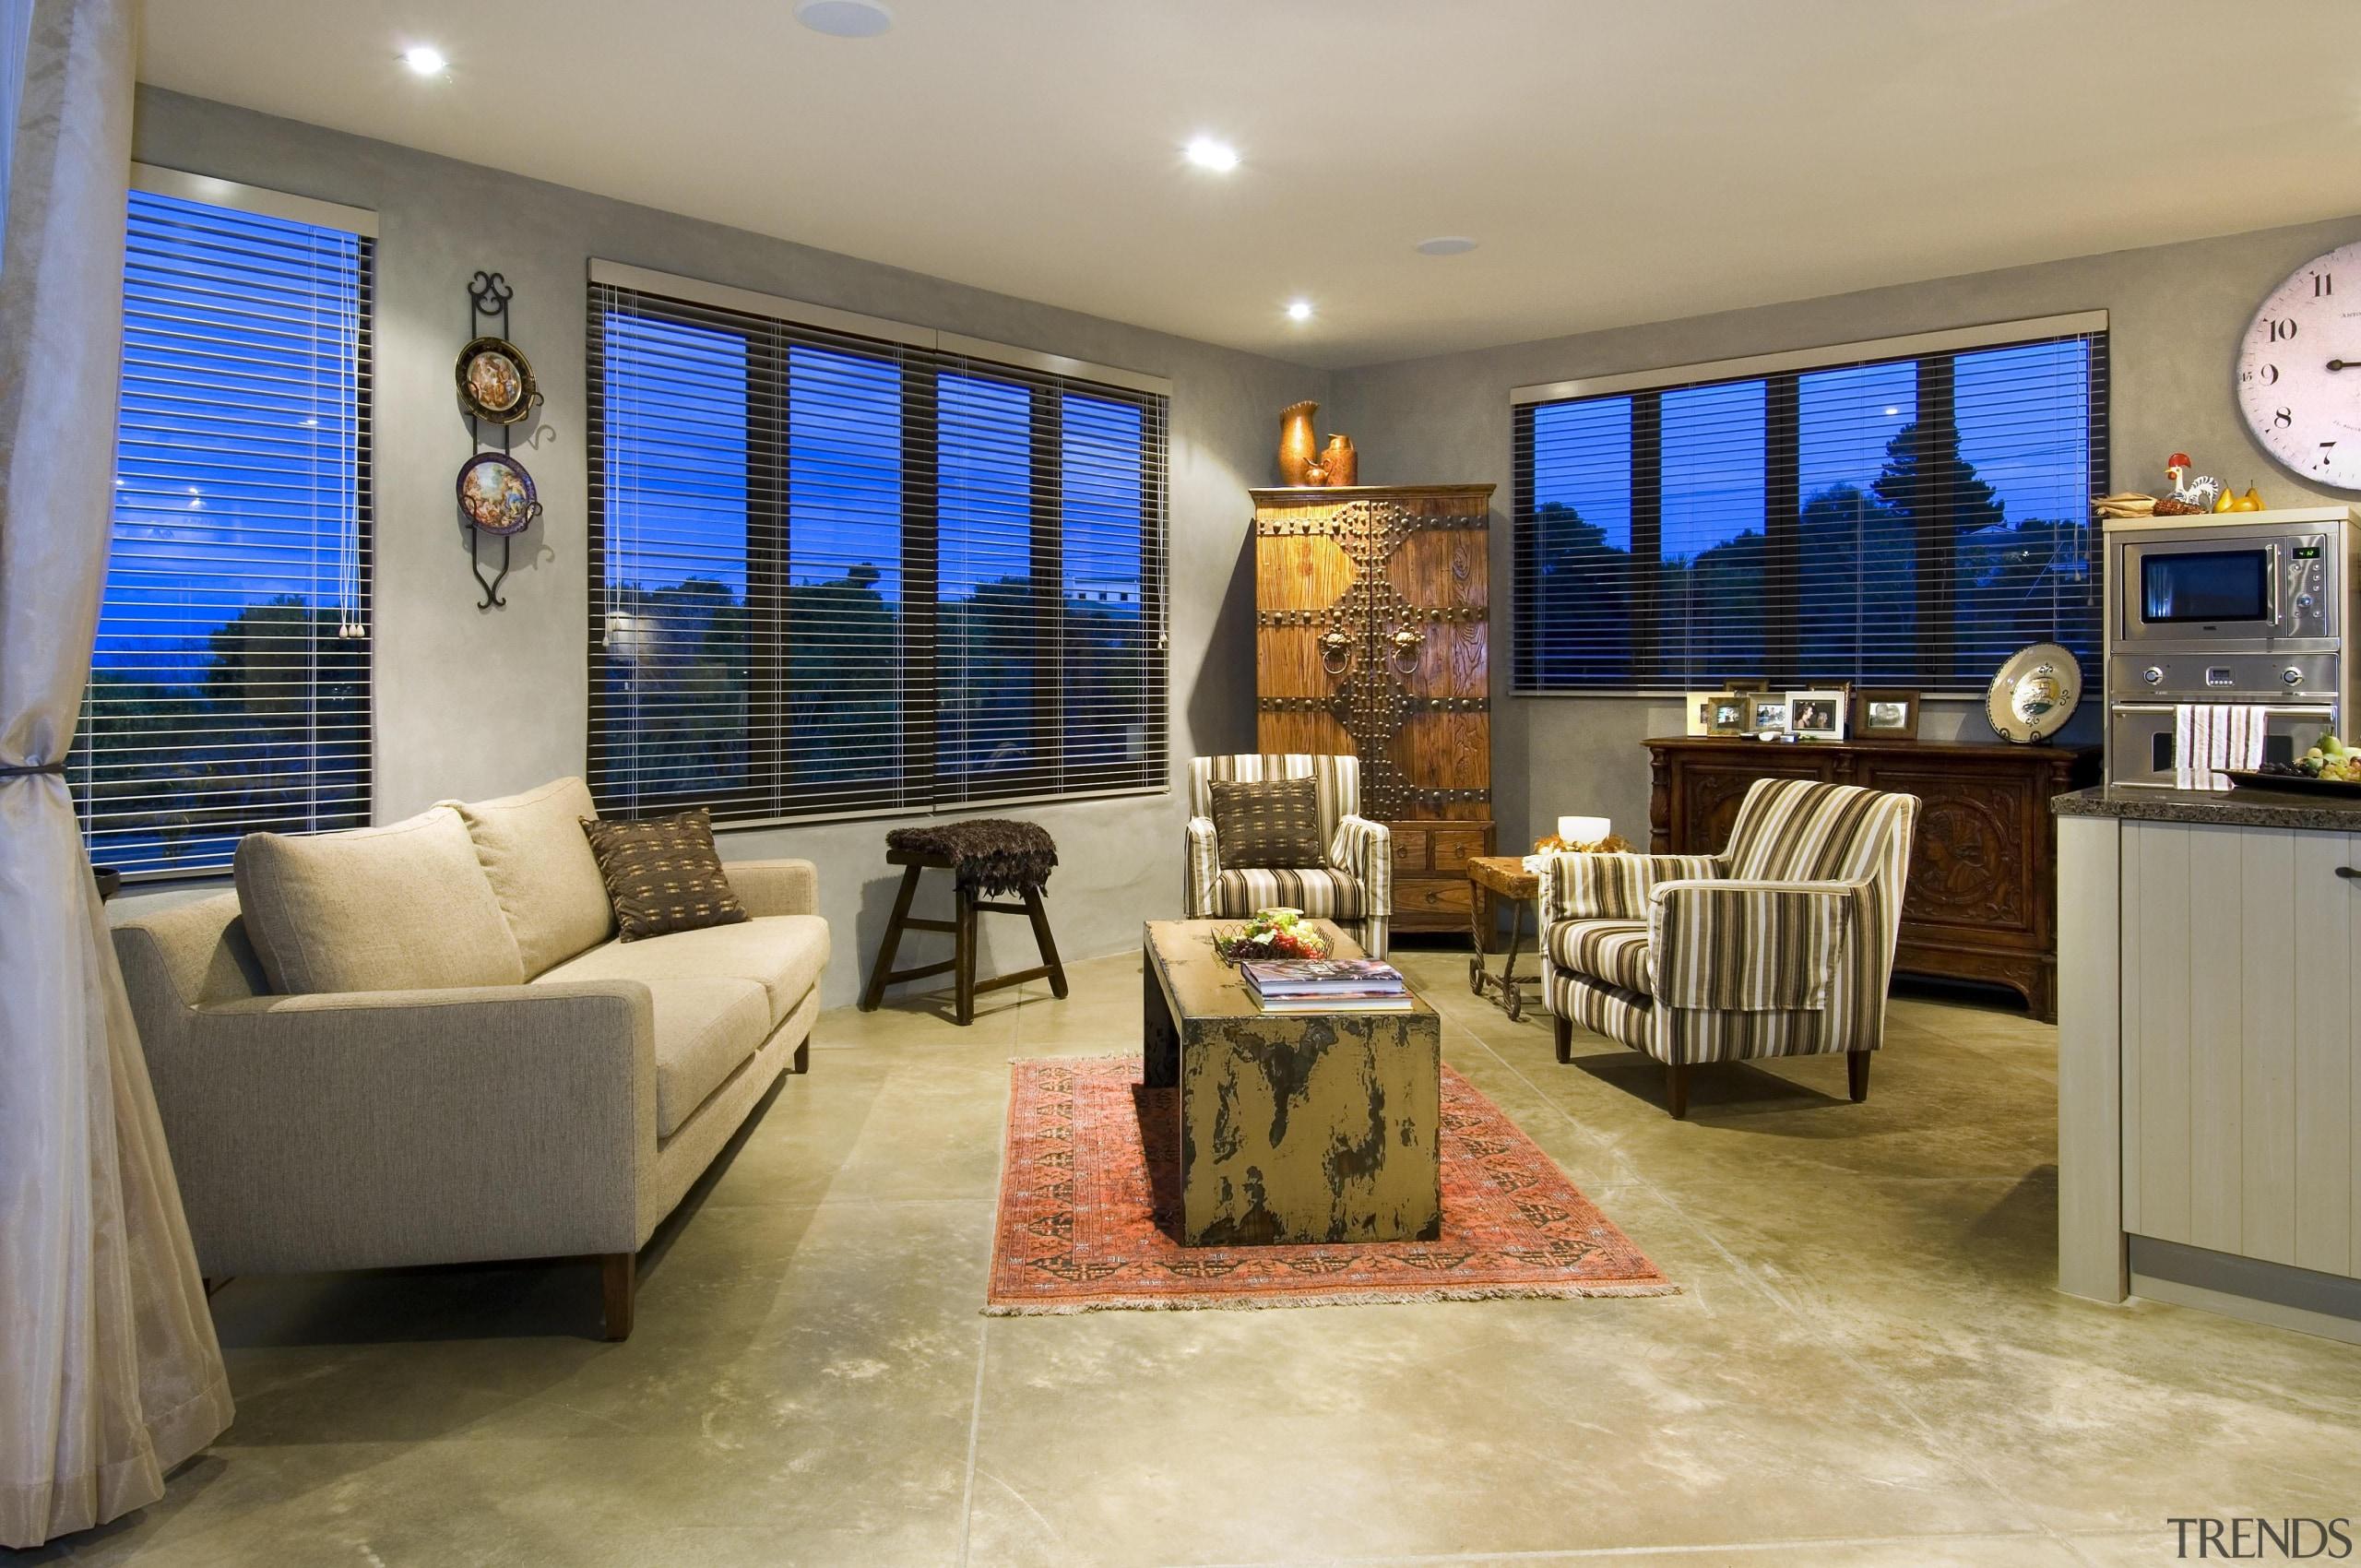 167mangawhai 9 - mangawhai_9 - estate | home estate, home, interior design, living room, property, real estate, room, orange, brown